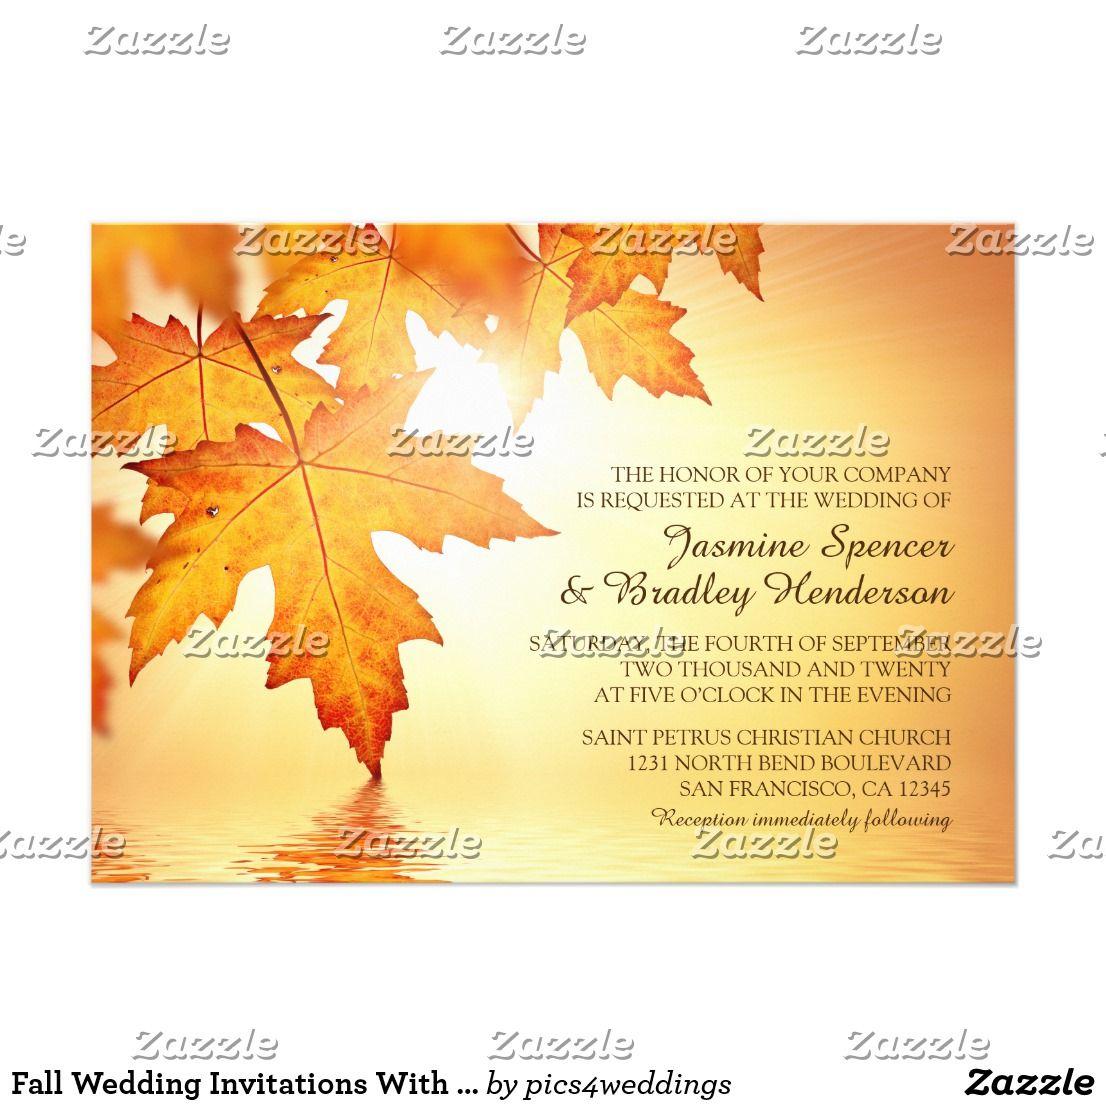 Fall Wedding Invitations With Orange Leaves   Reception invitations ...